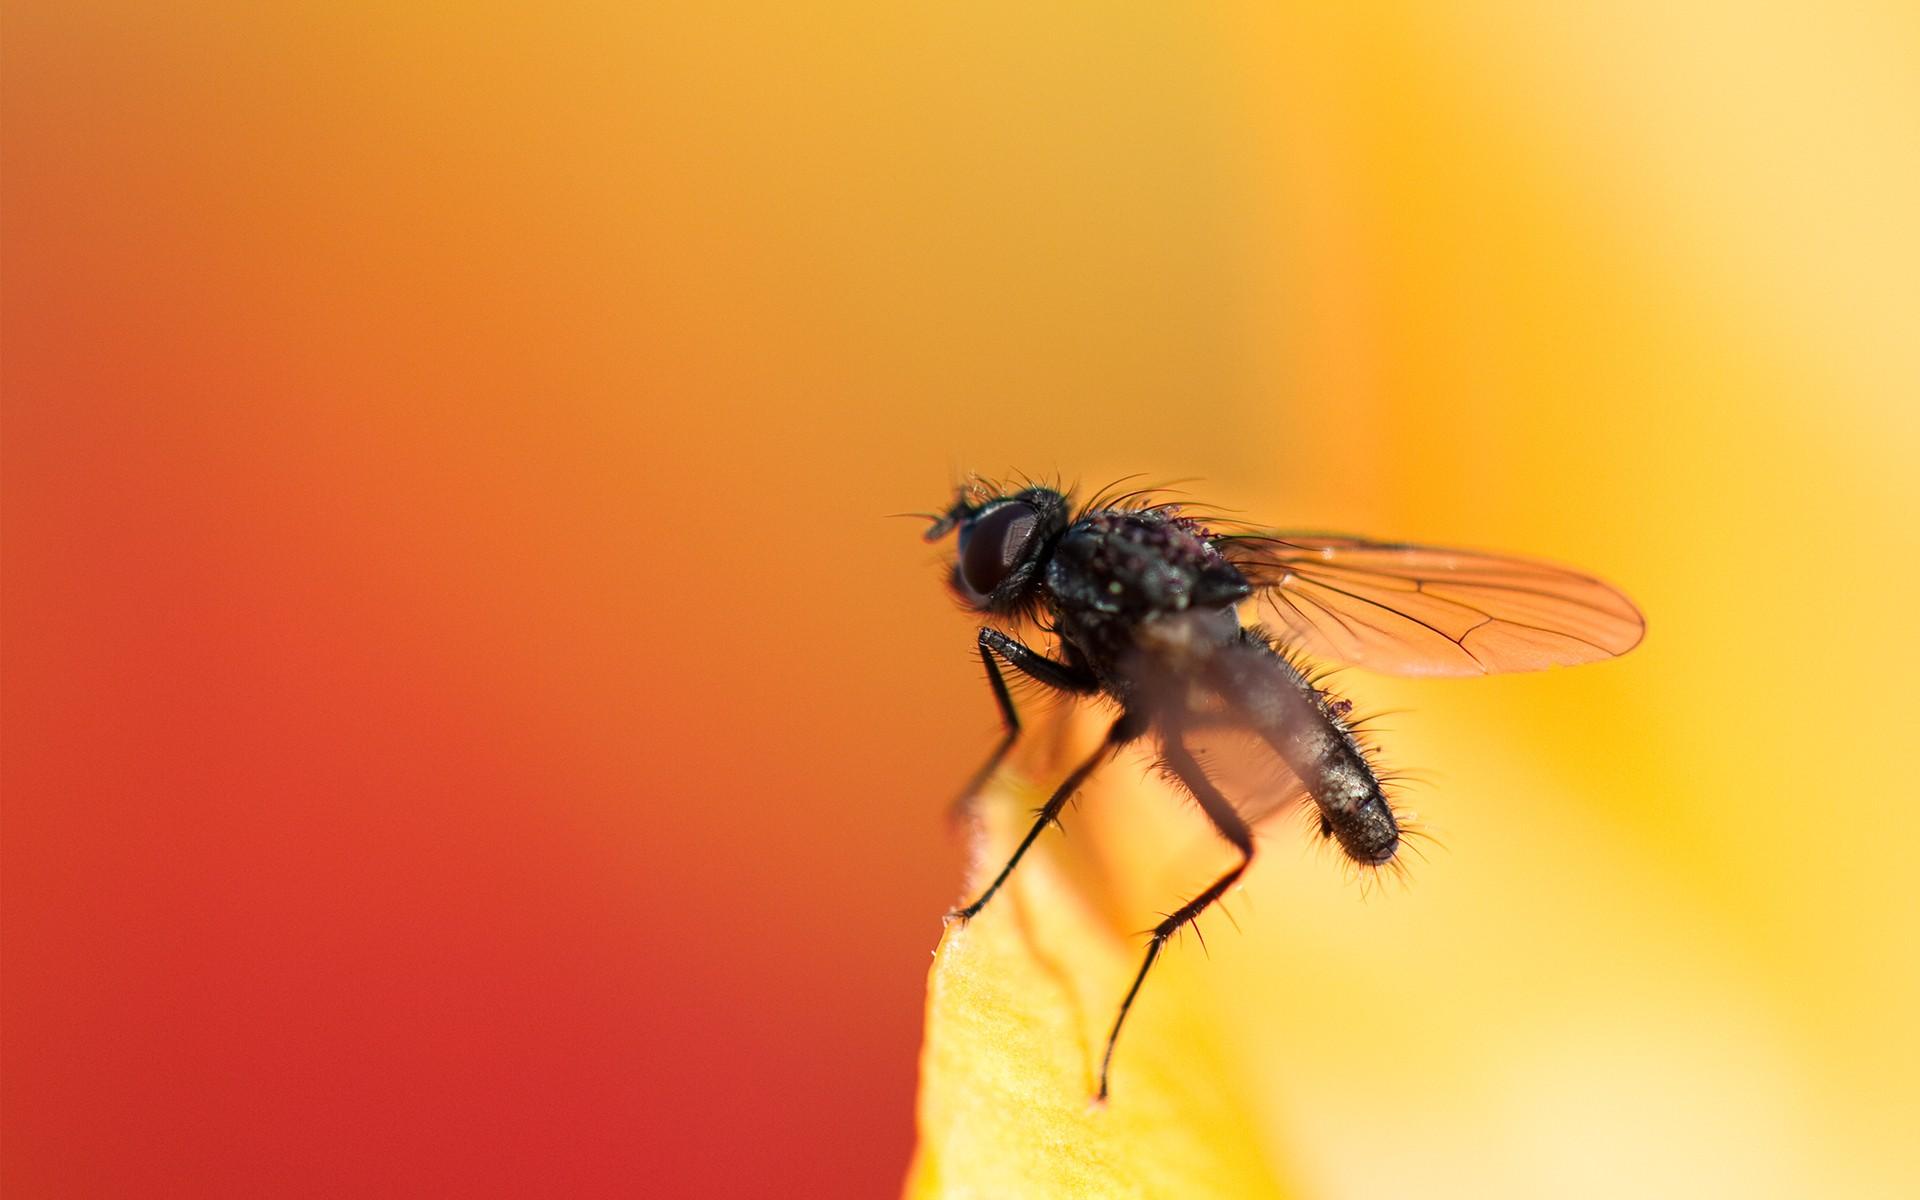 Una mosca - 1920x1200